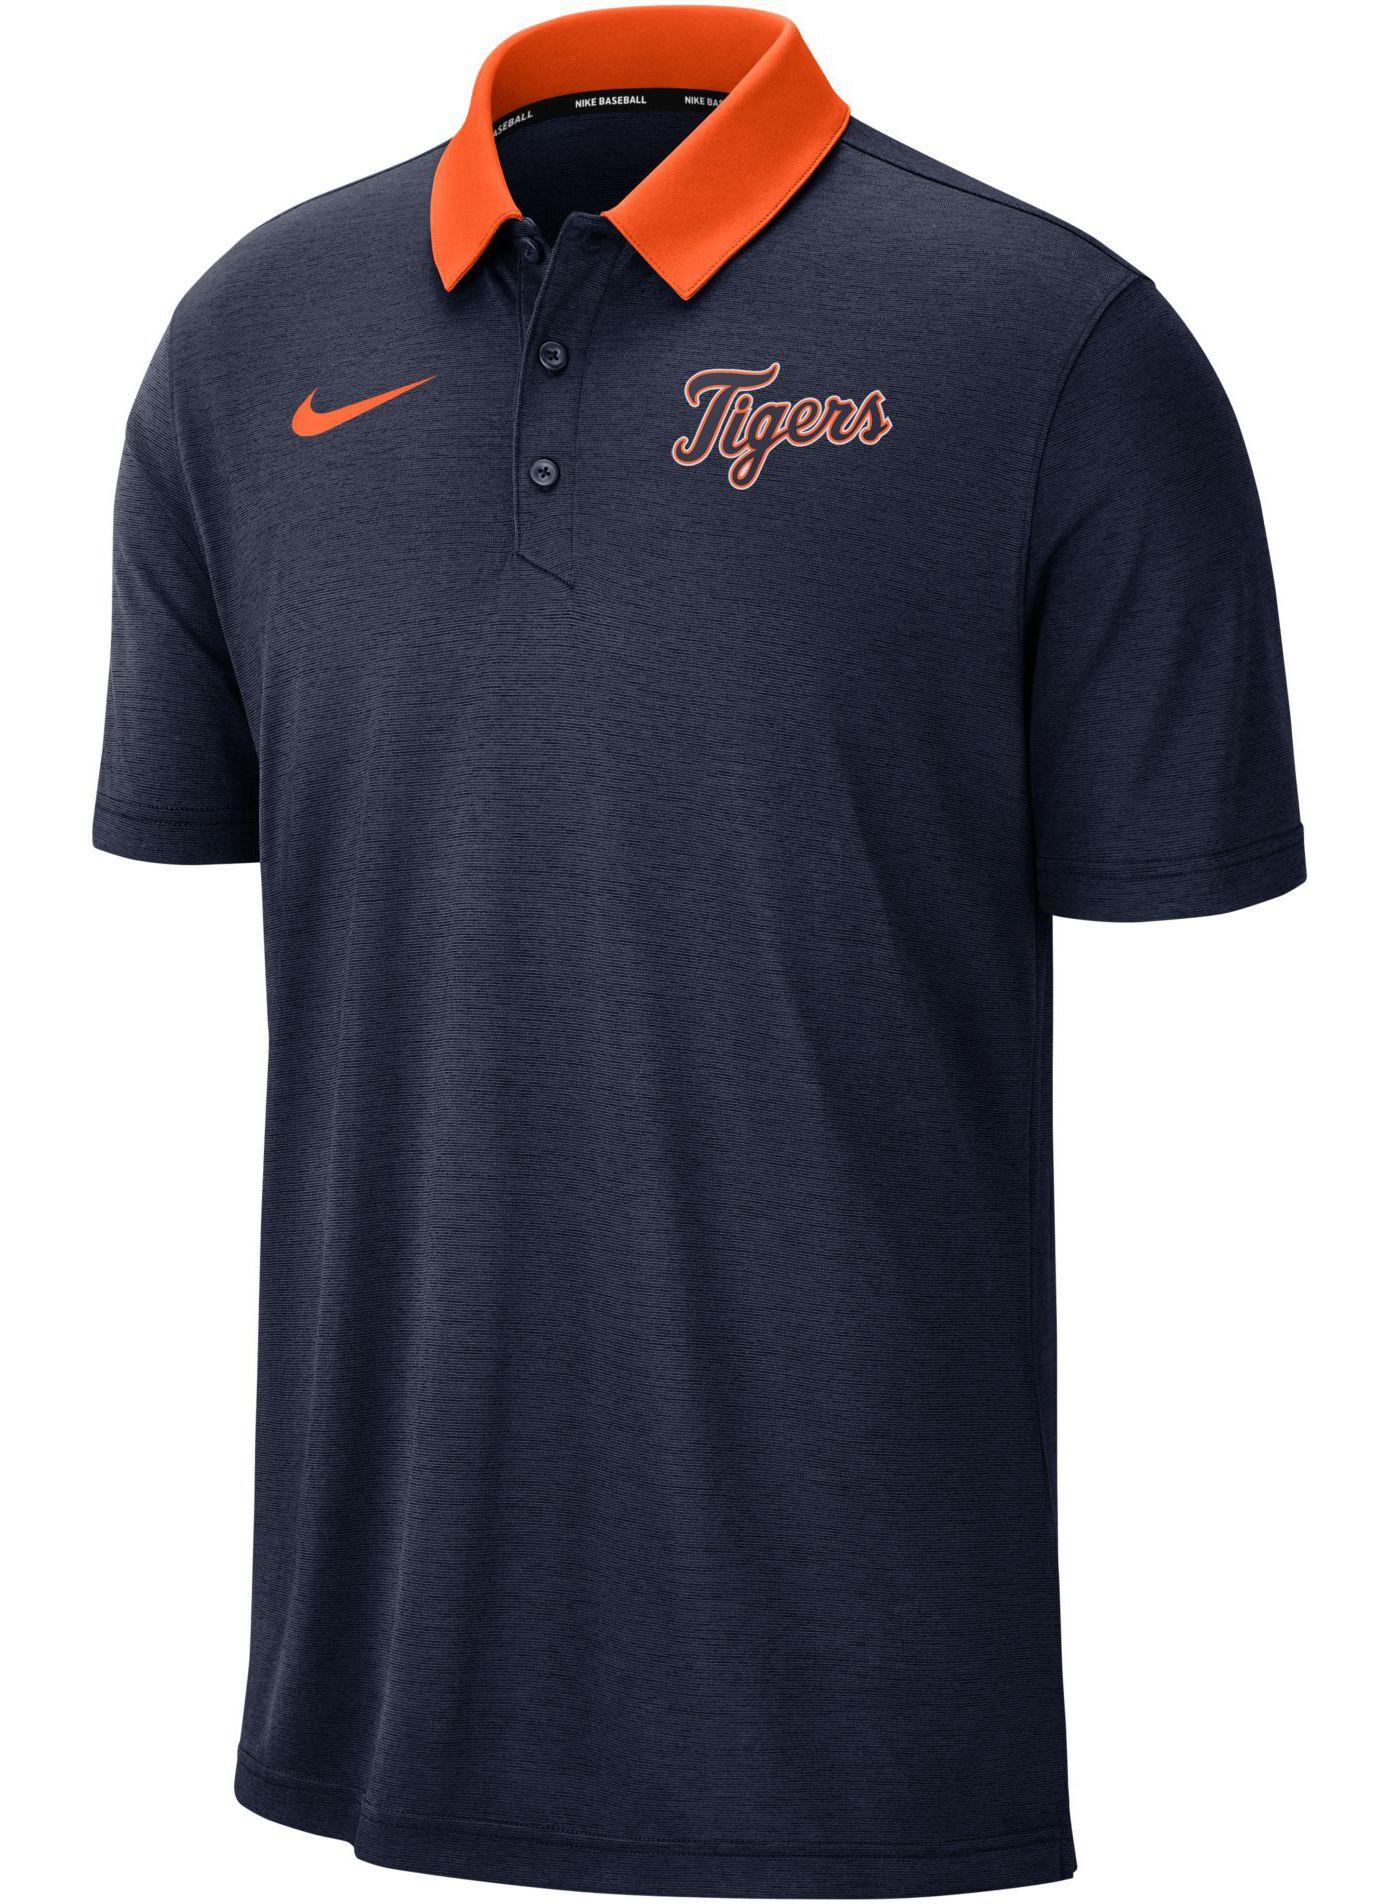 Nike Men's Detroit Tigers Breathe Polo